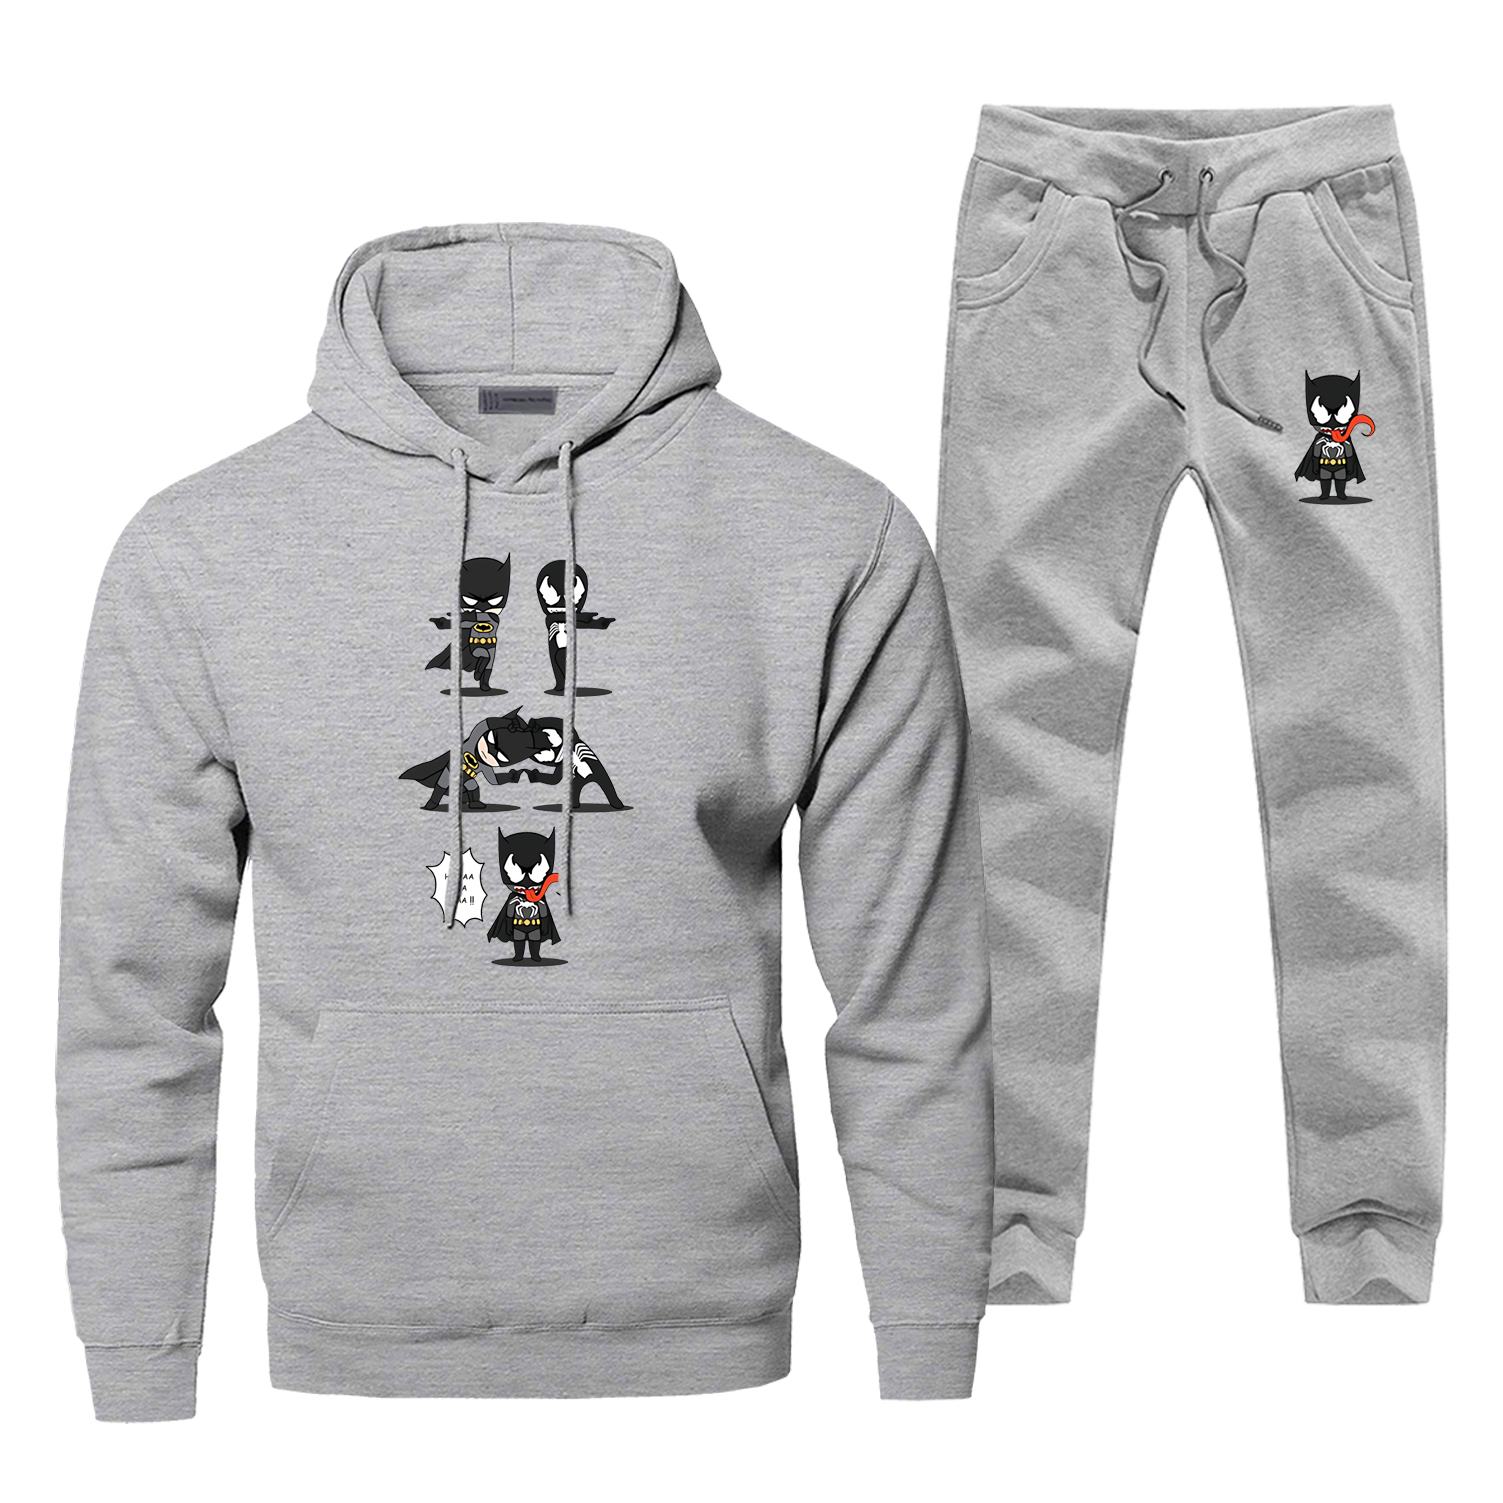 Funny Design Marvel Super Hero Batman Venom Fit Print Sweatshirt Hoodies Pants Two Piece Sets Men Fleece Sportswear Sweatpants